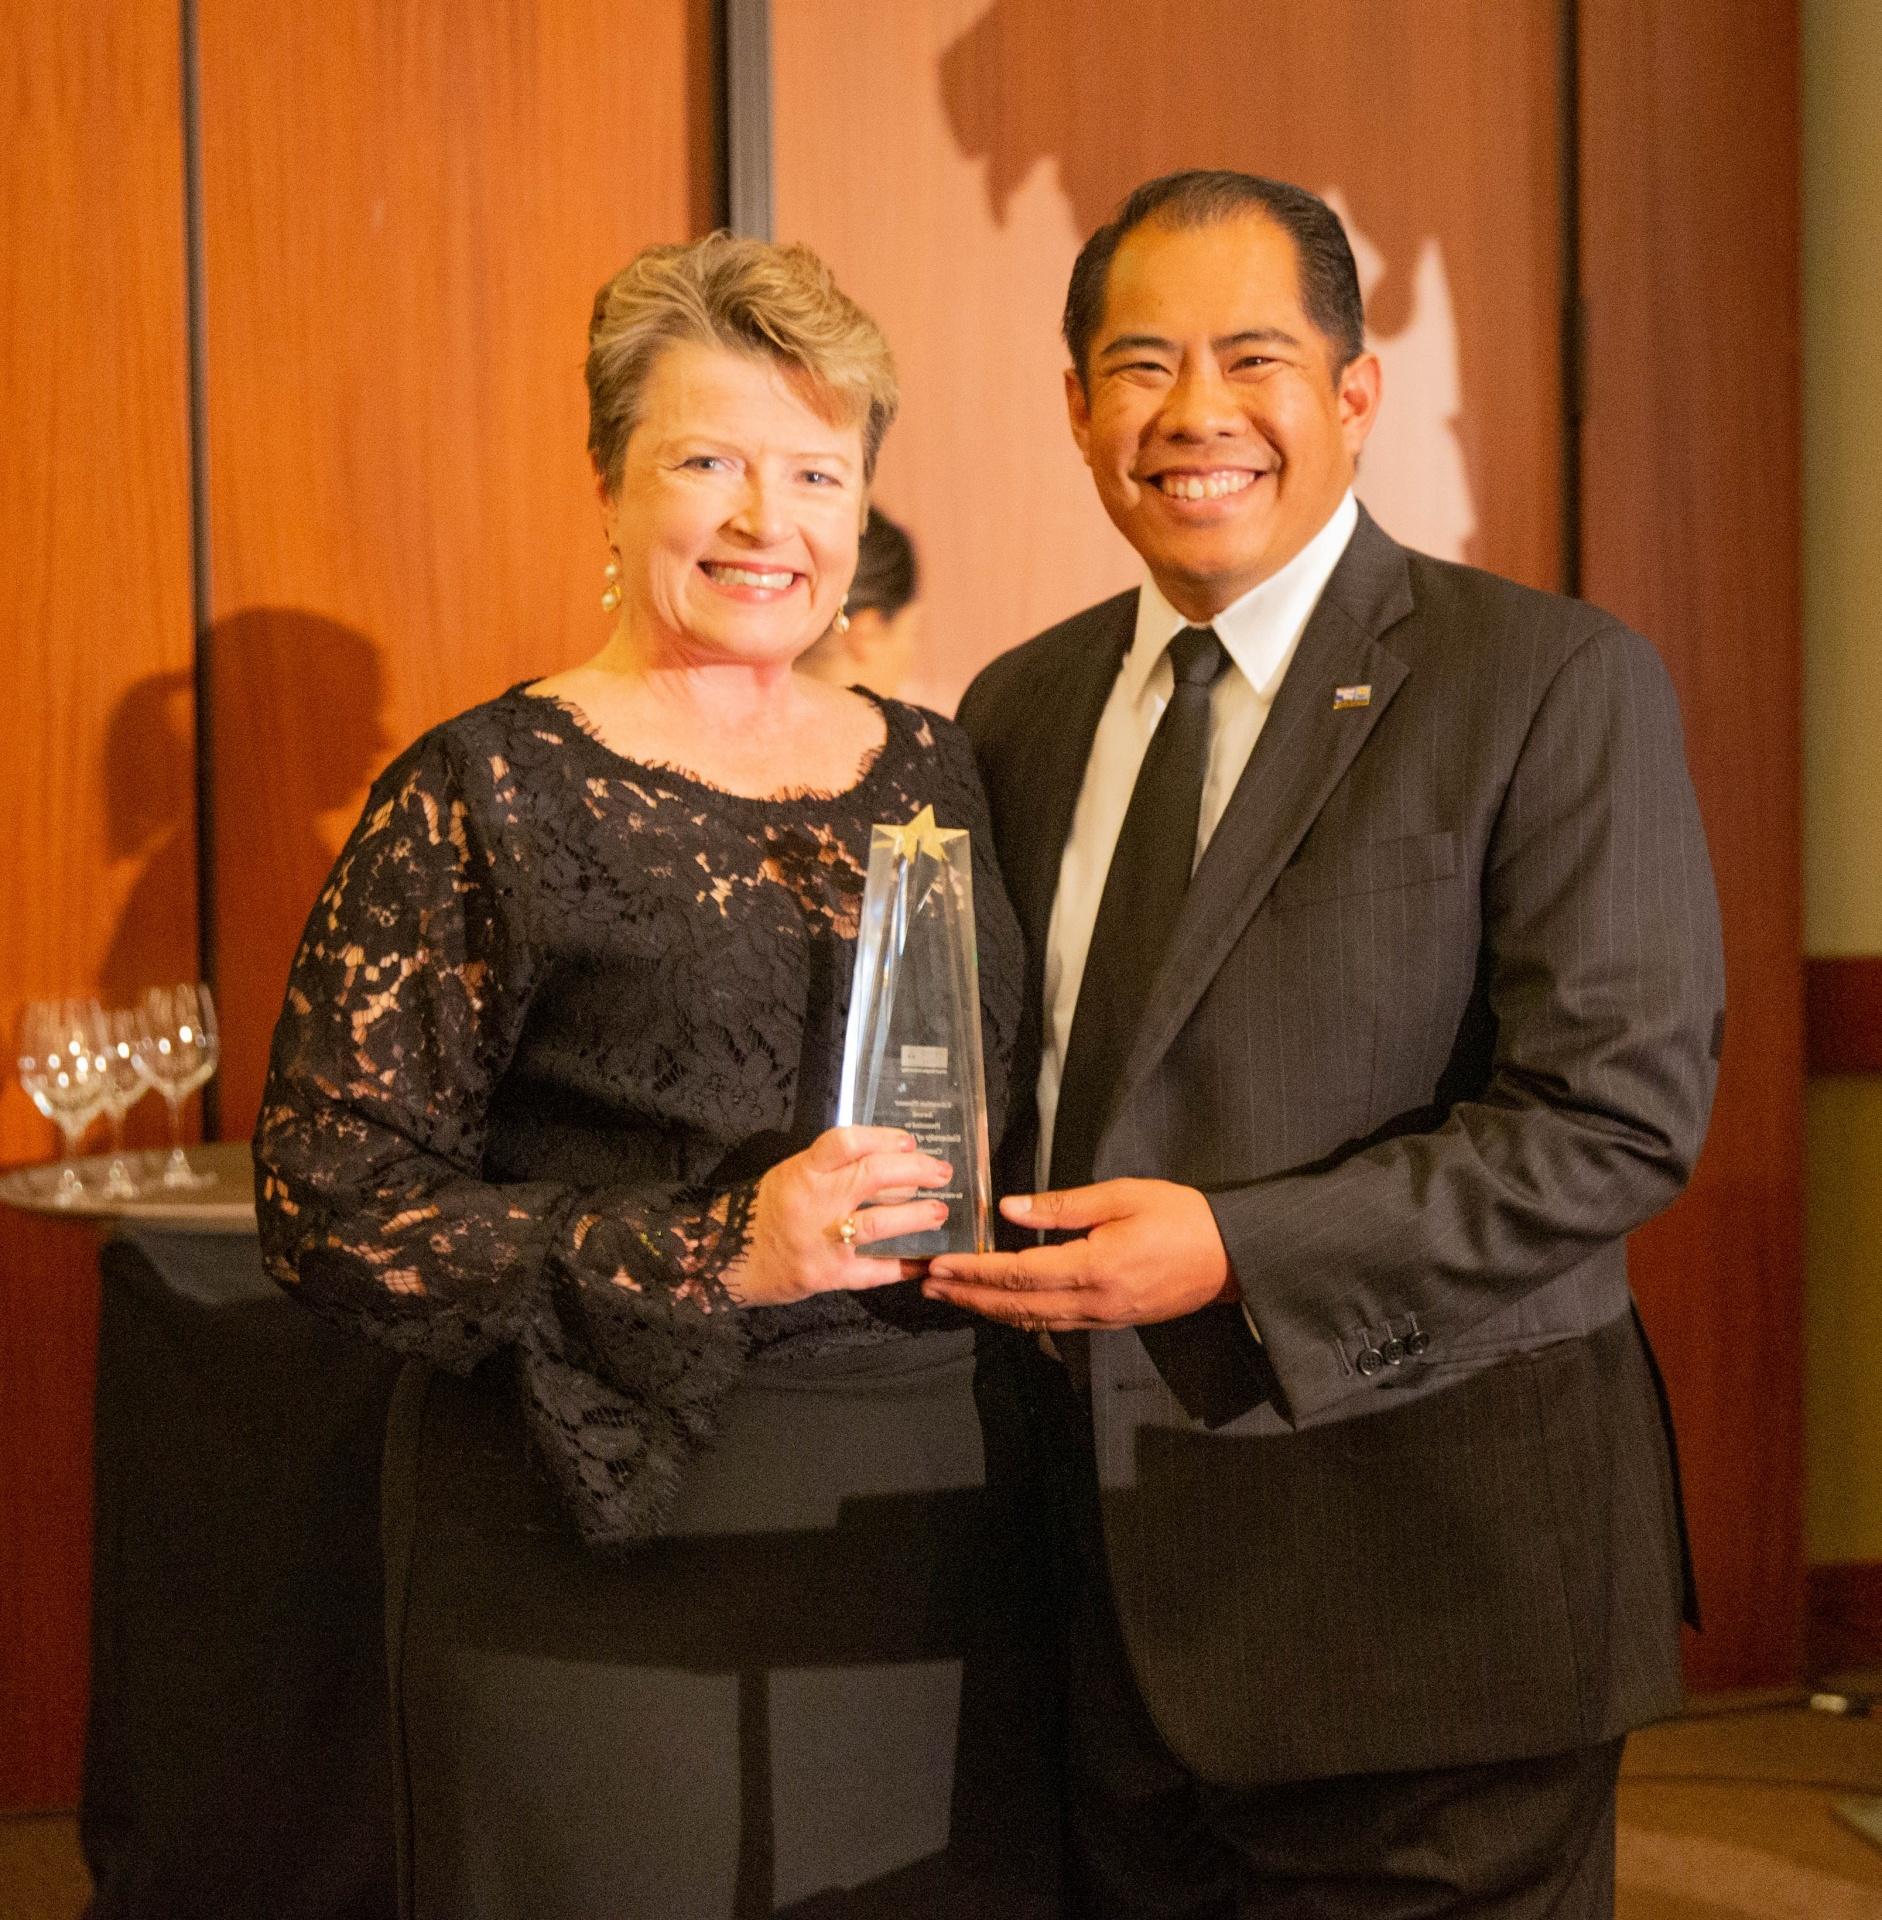 Sherri Mylott holding the Education Pioneer Award